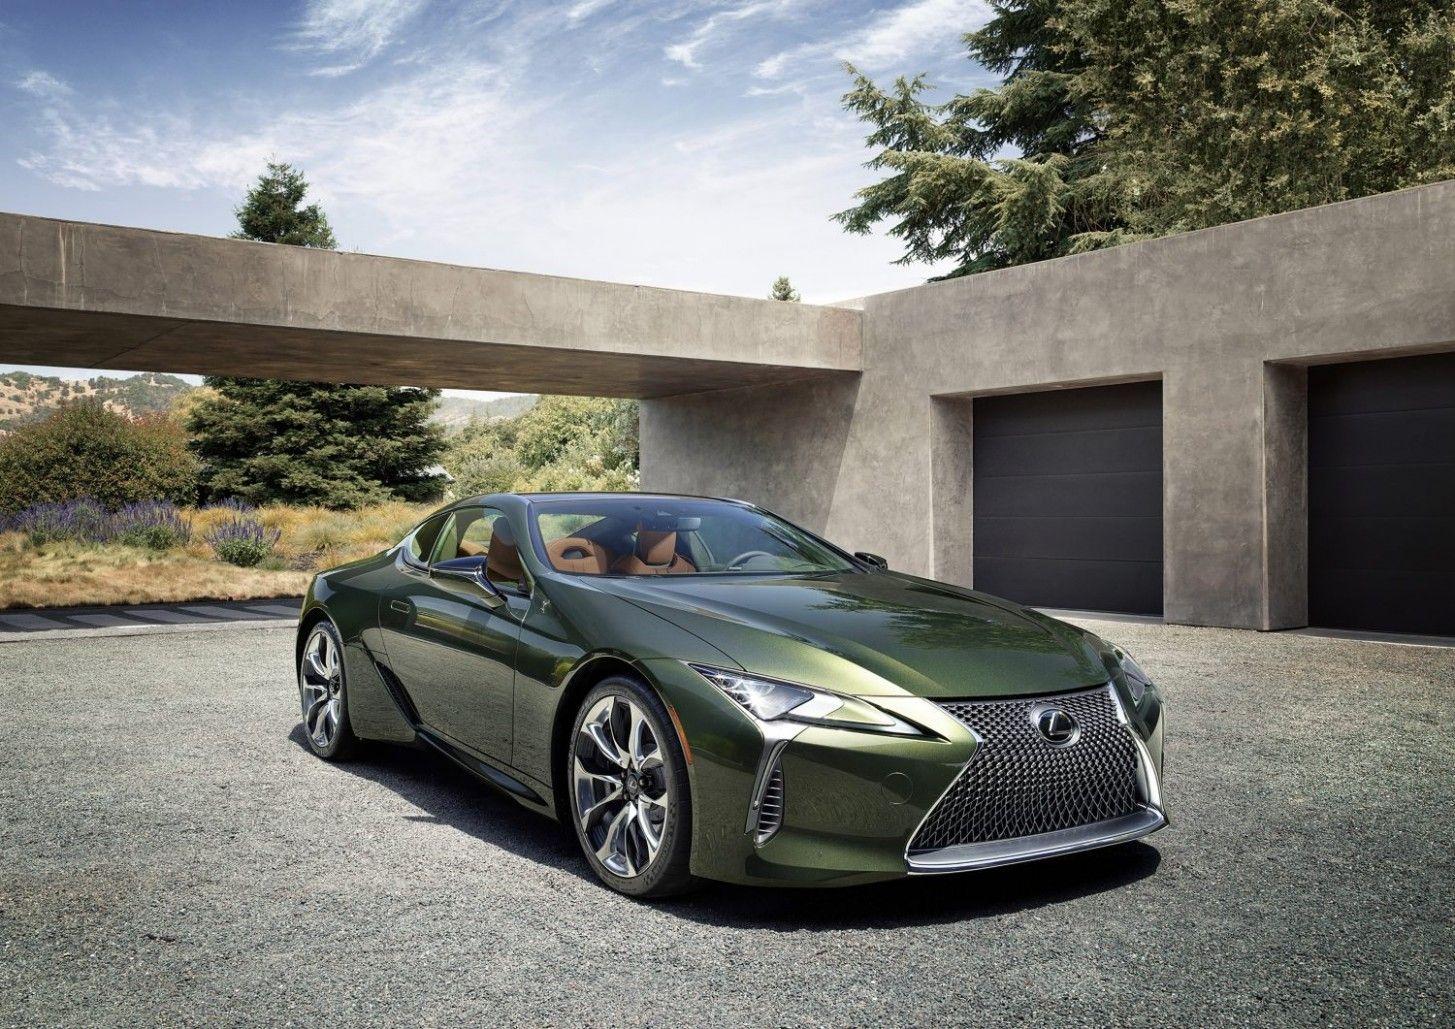 Lexus Two Door Coupe 2020 Concept And Review Lexus Lc Lexus Lexus Coupe